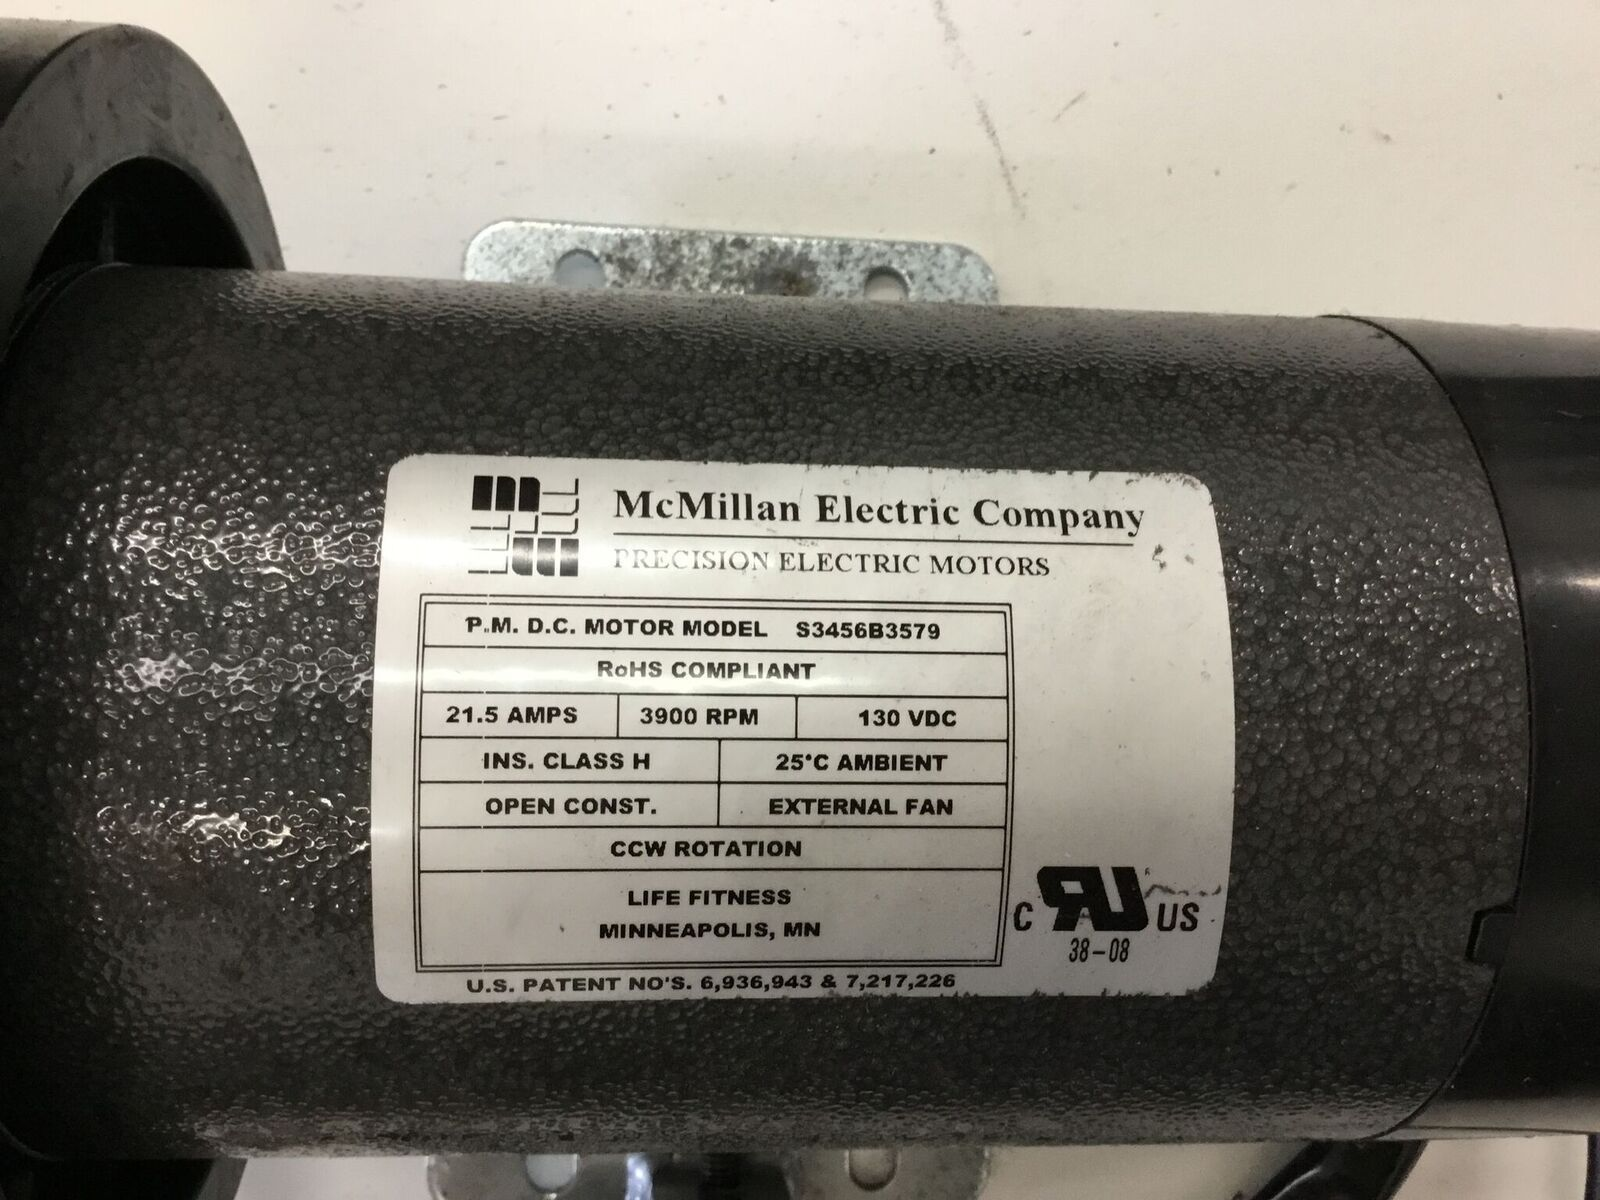 Life Fitness F3 T3 Treadmill Mcmillan Electric Dc Drive Motor S3456b3579 Ebay Link